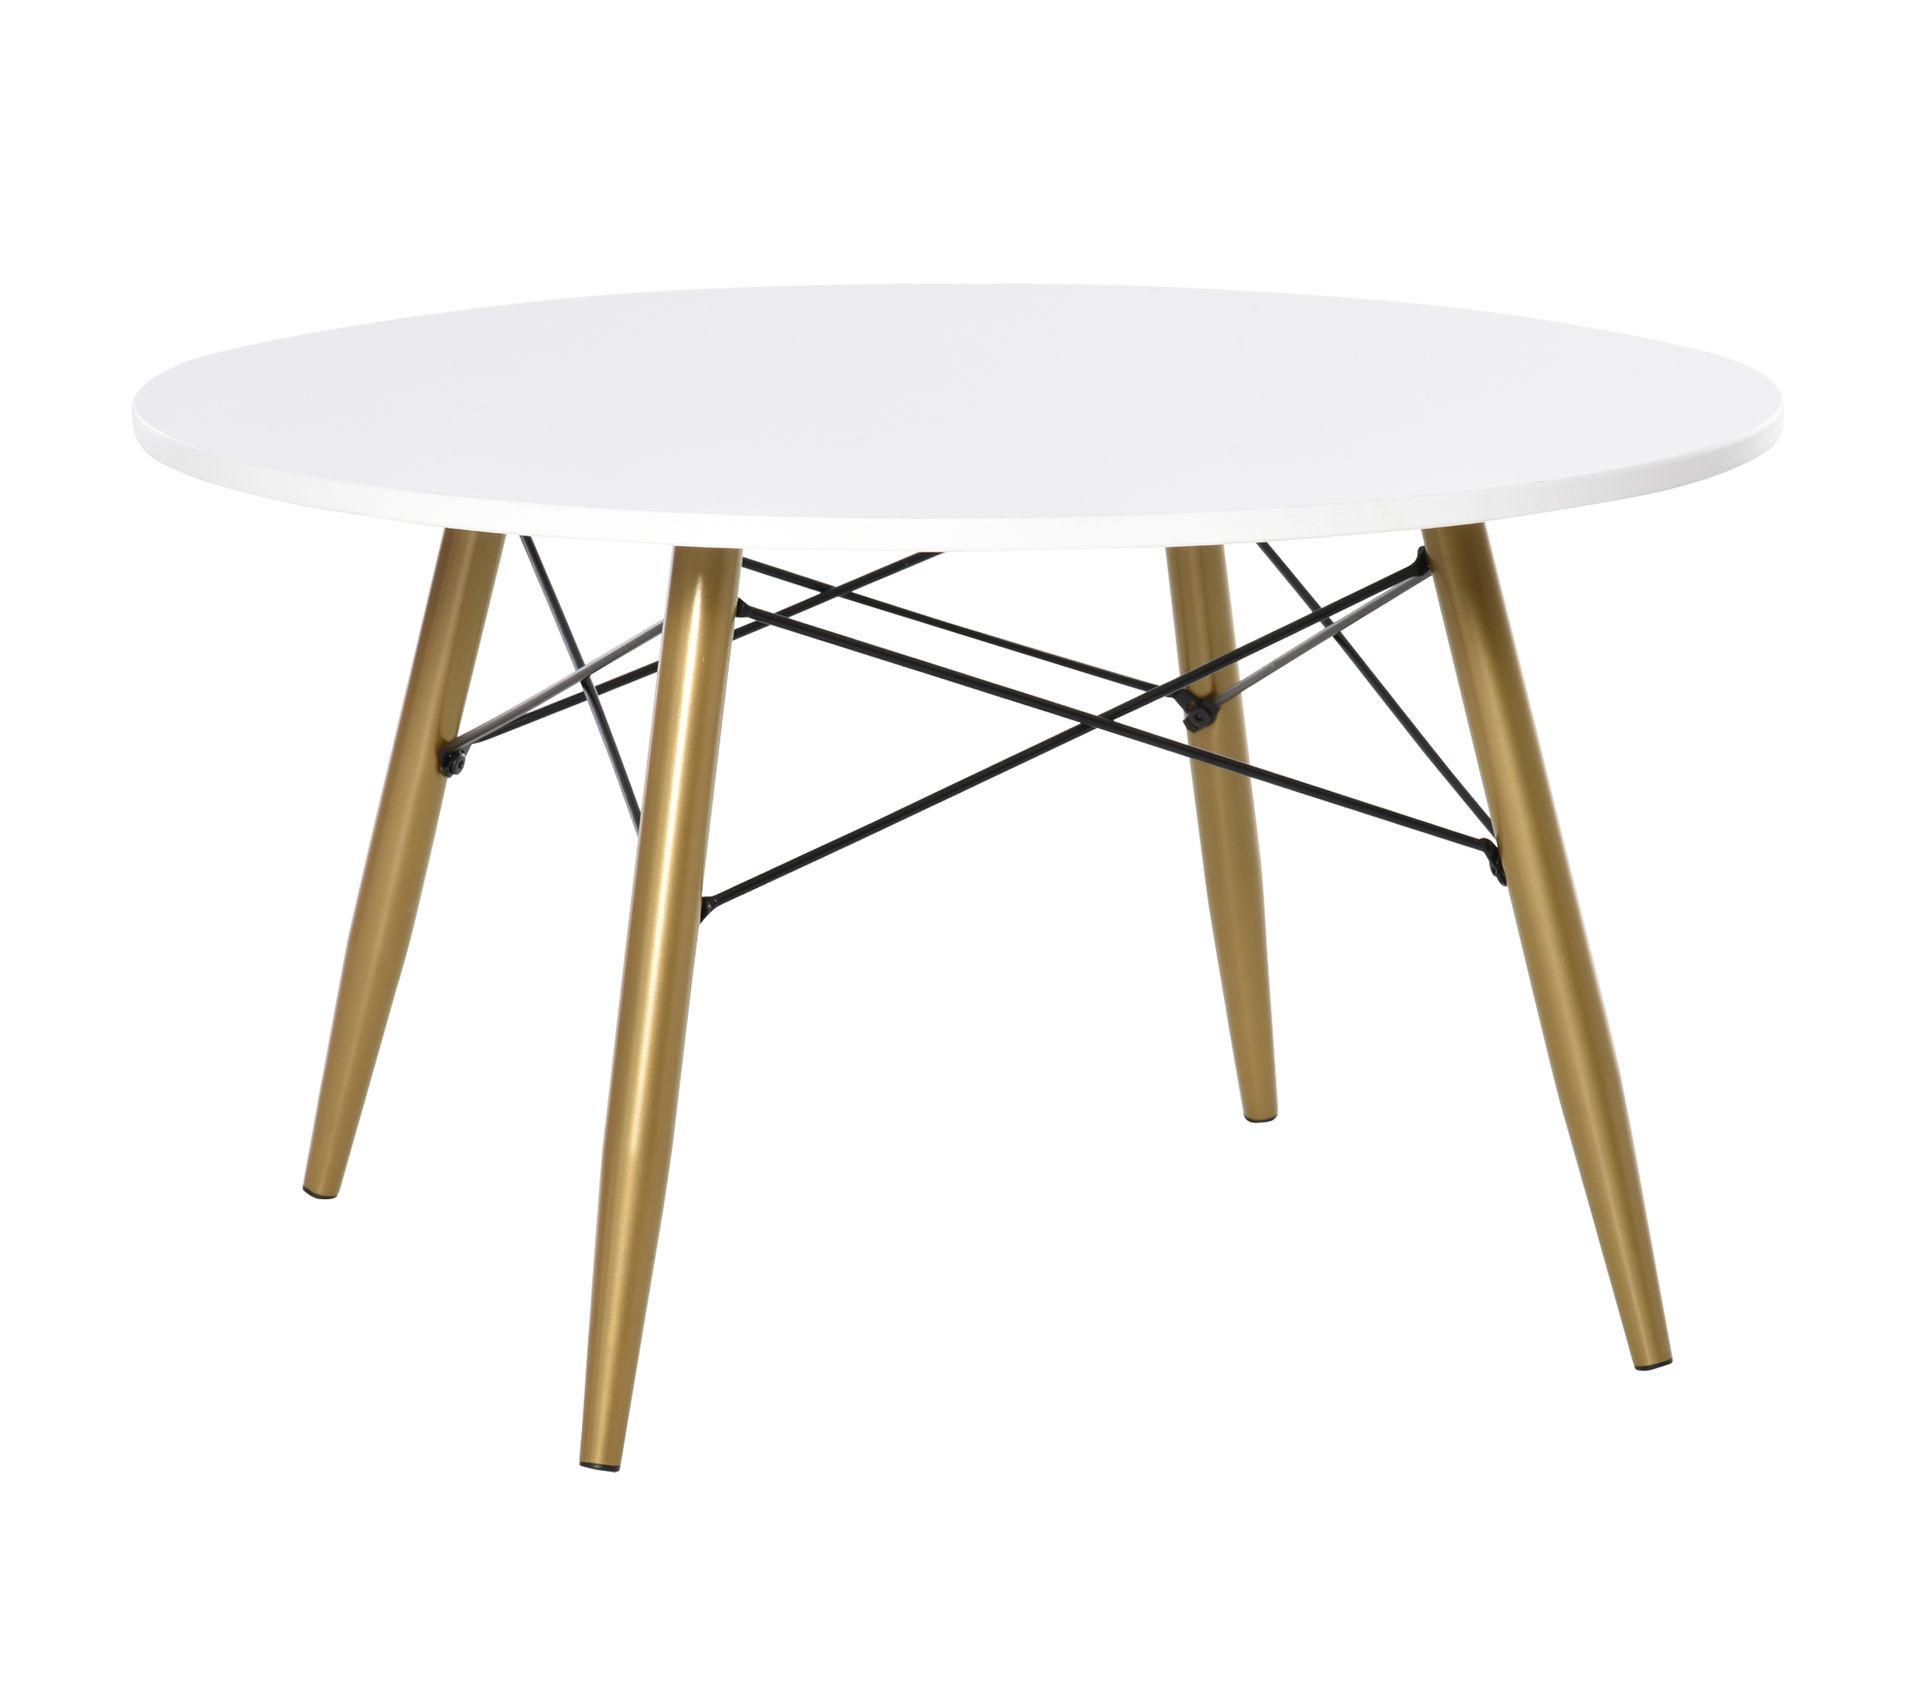 Table Basse Ronde Design Scandinave O 60 X H55 Cm Metal Imitation